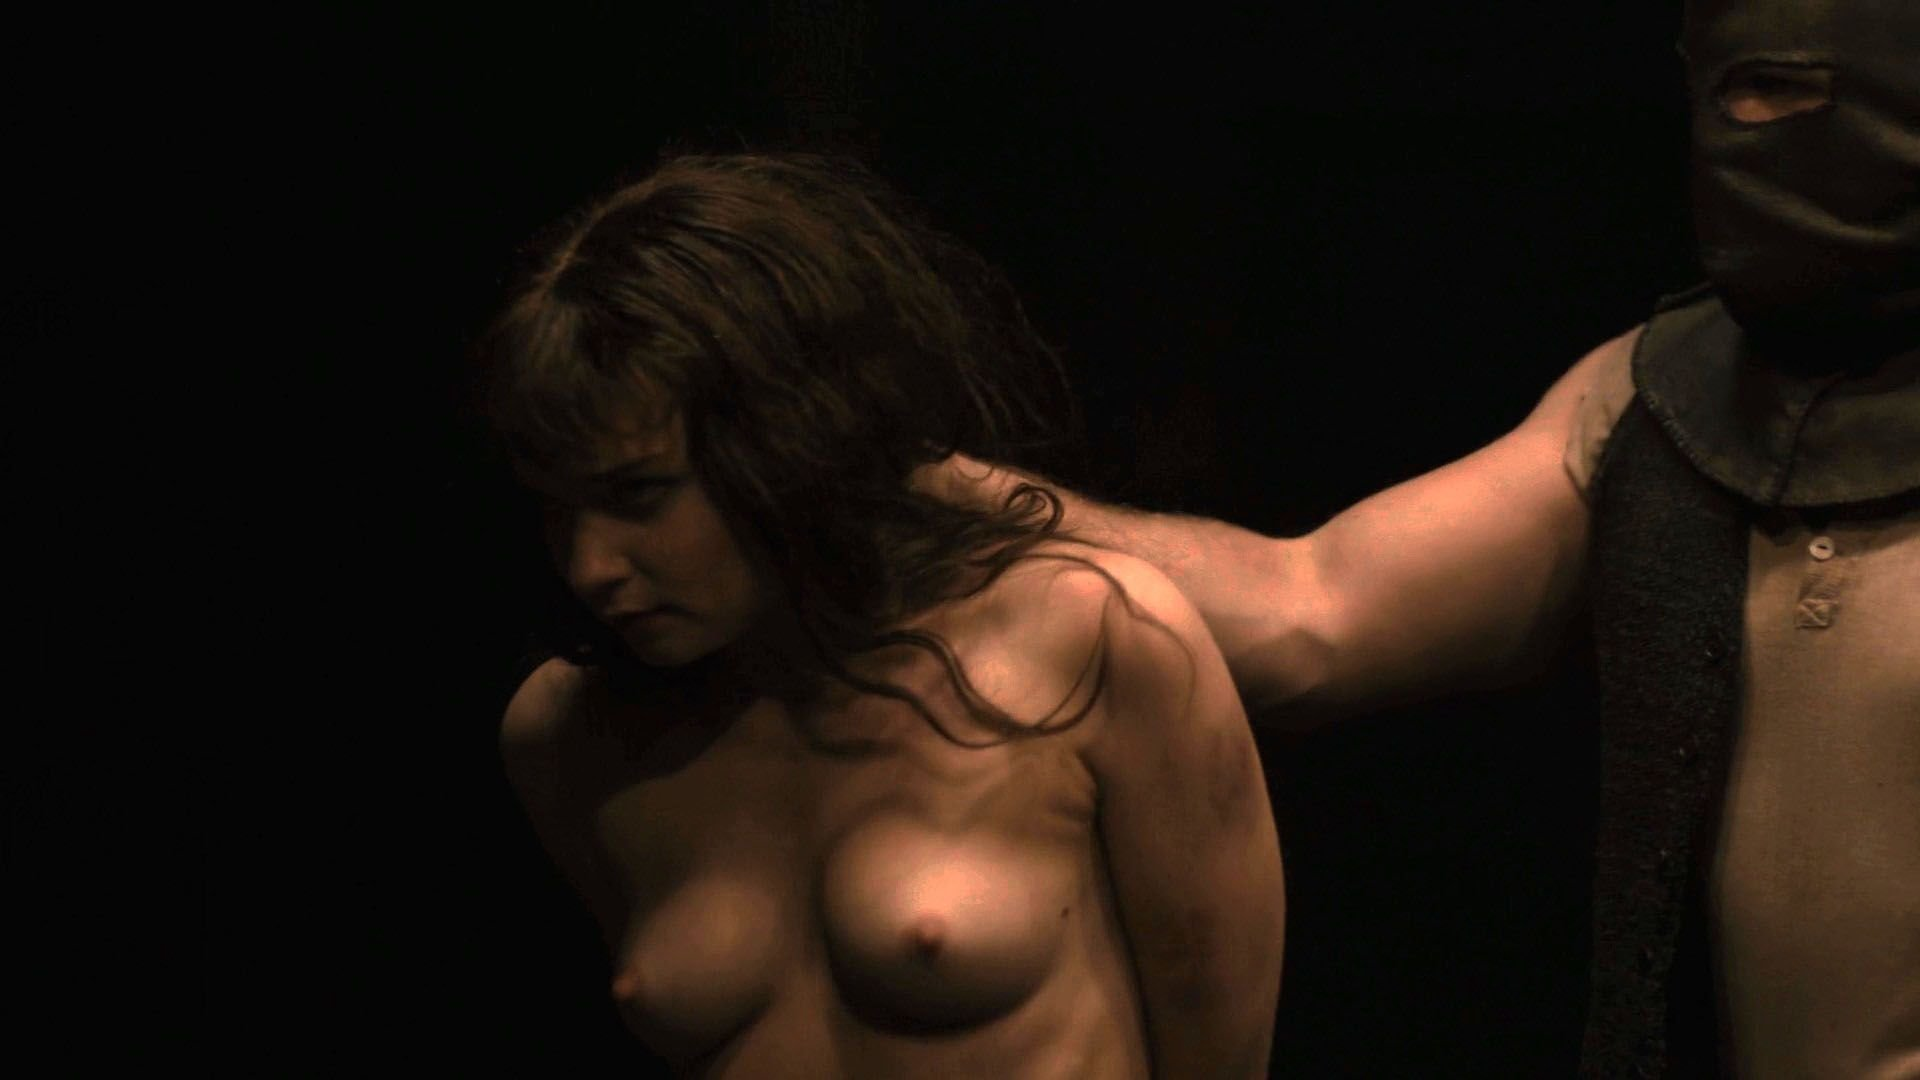 Billie britt the english whore - 3 part 5